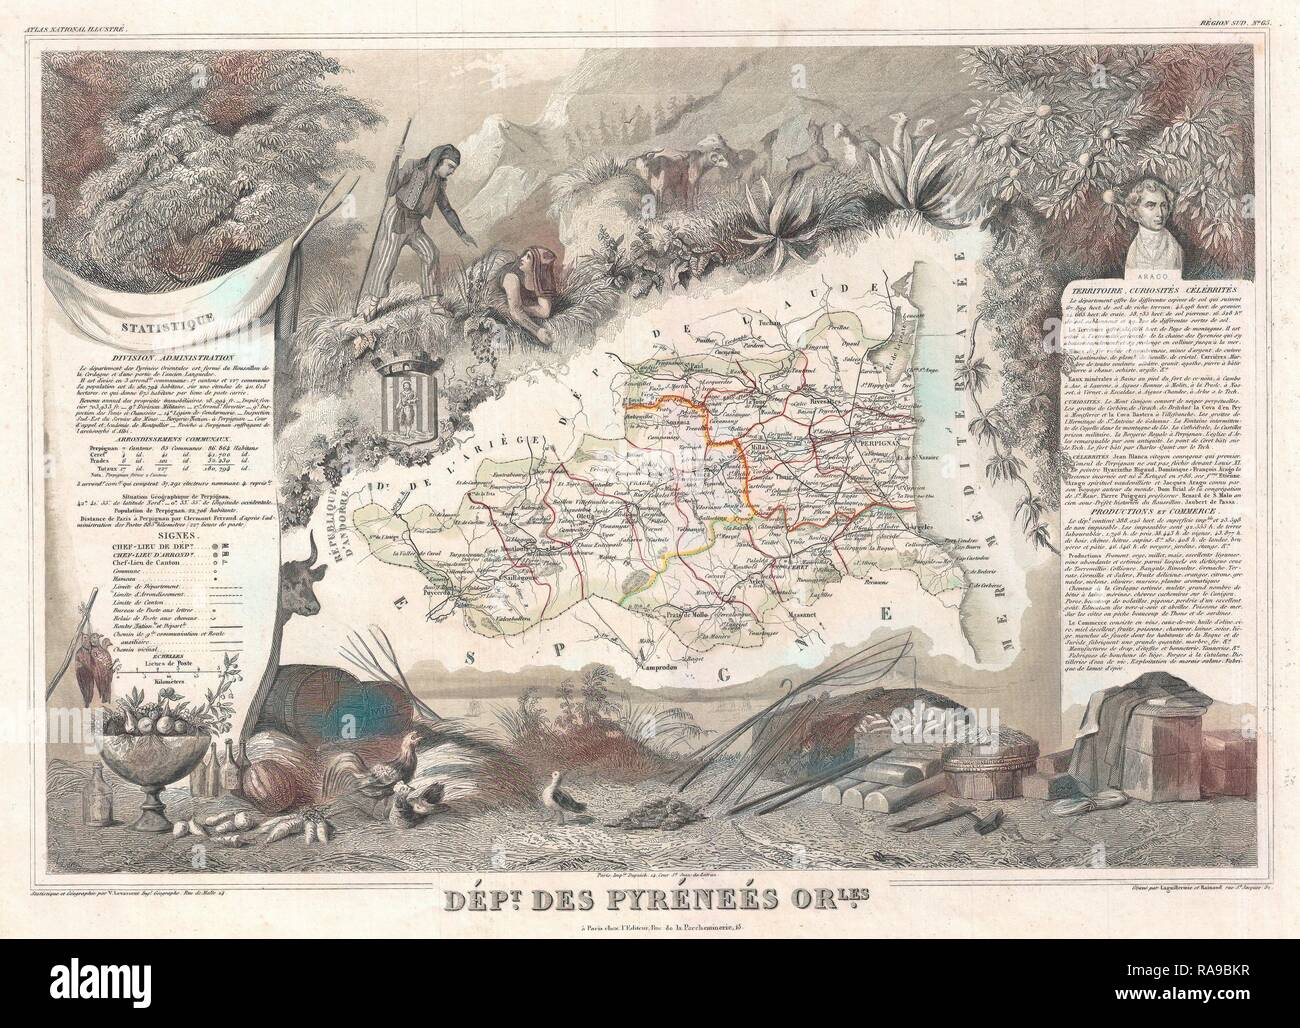 Pyrenees-orientales 1878 Old Antique Map Plan Chart PyrÉnÉes-orientales Art Prints Maps, Atlases & Globes